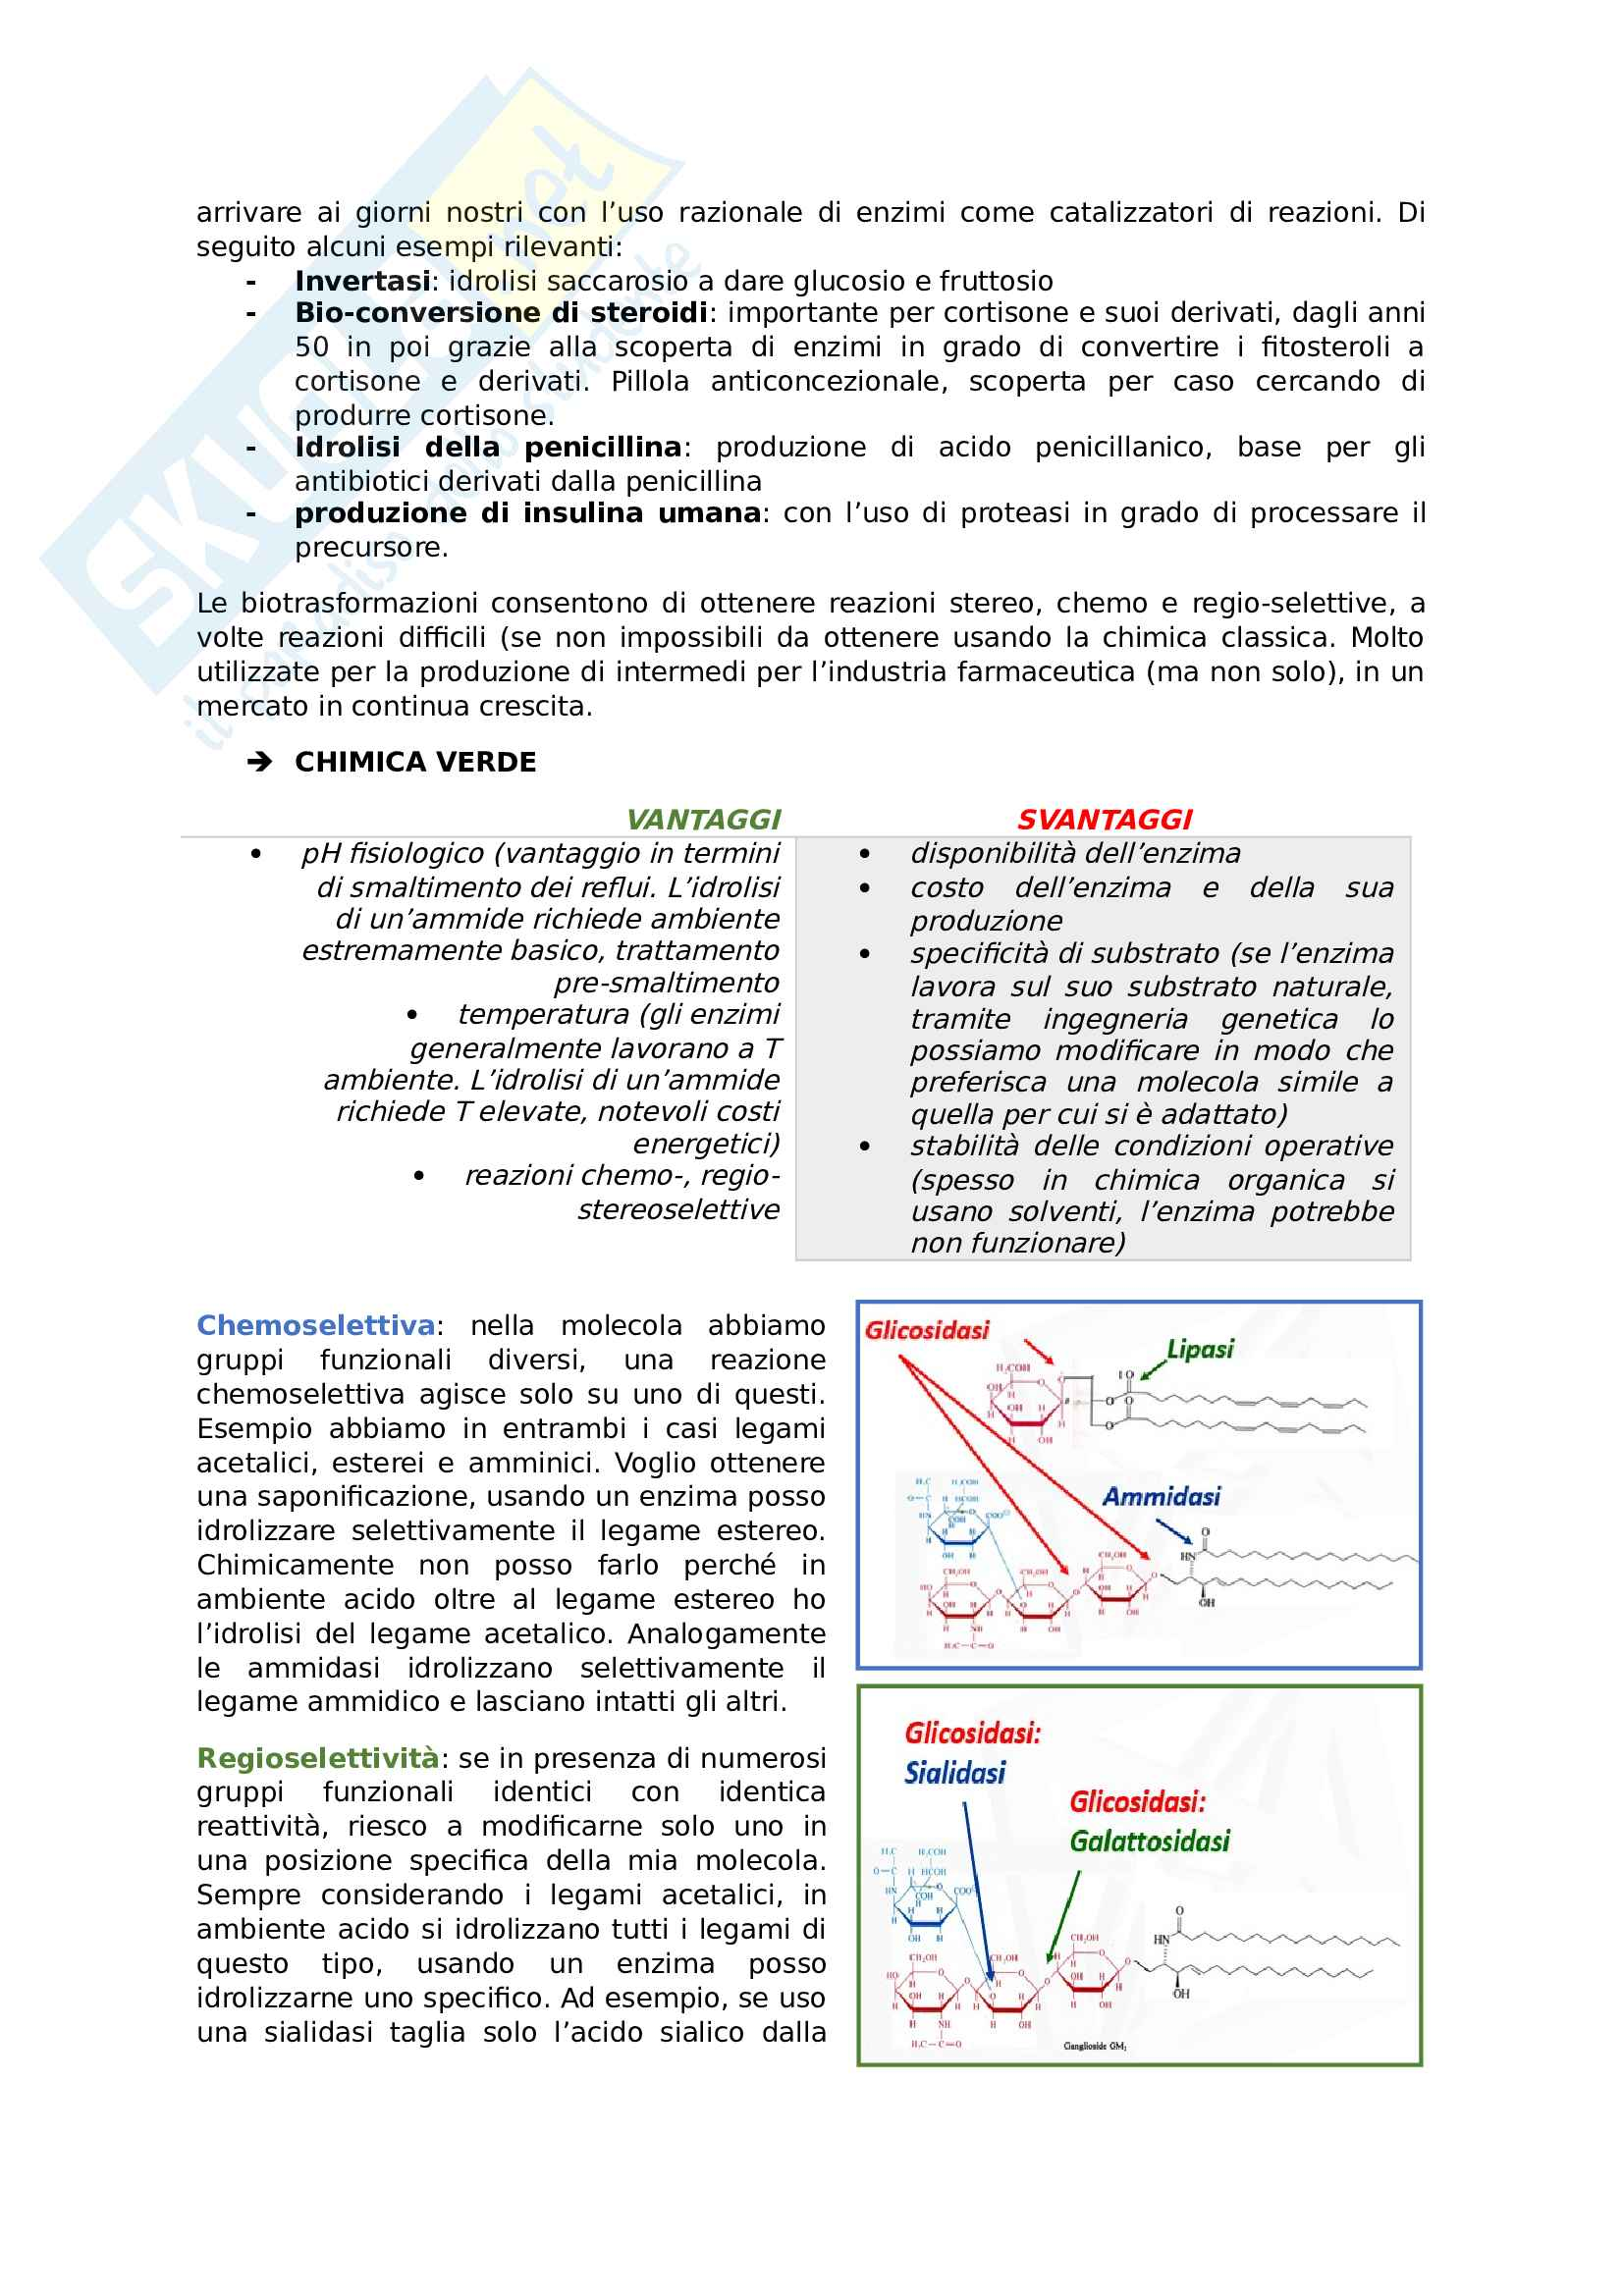 Chimica organica applicata alle biotecnologie Pag. 2